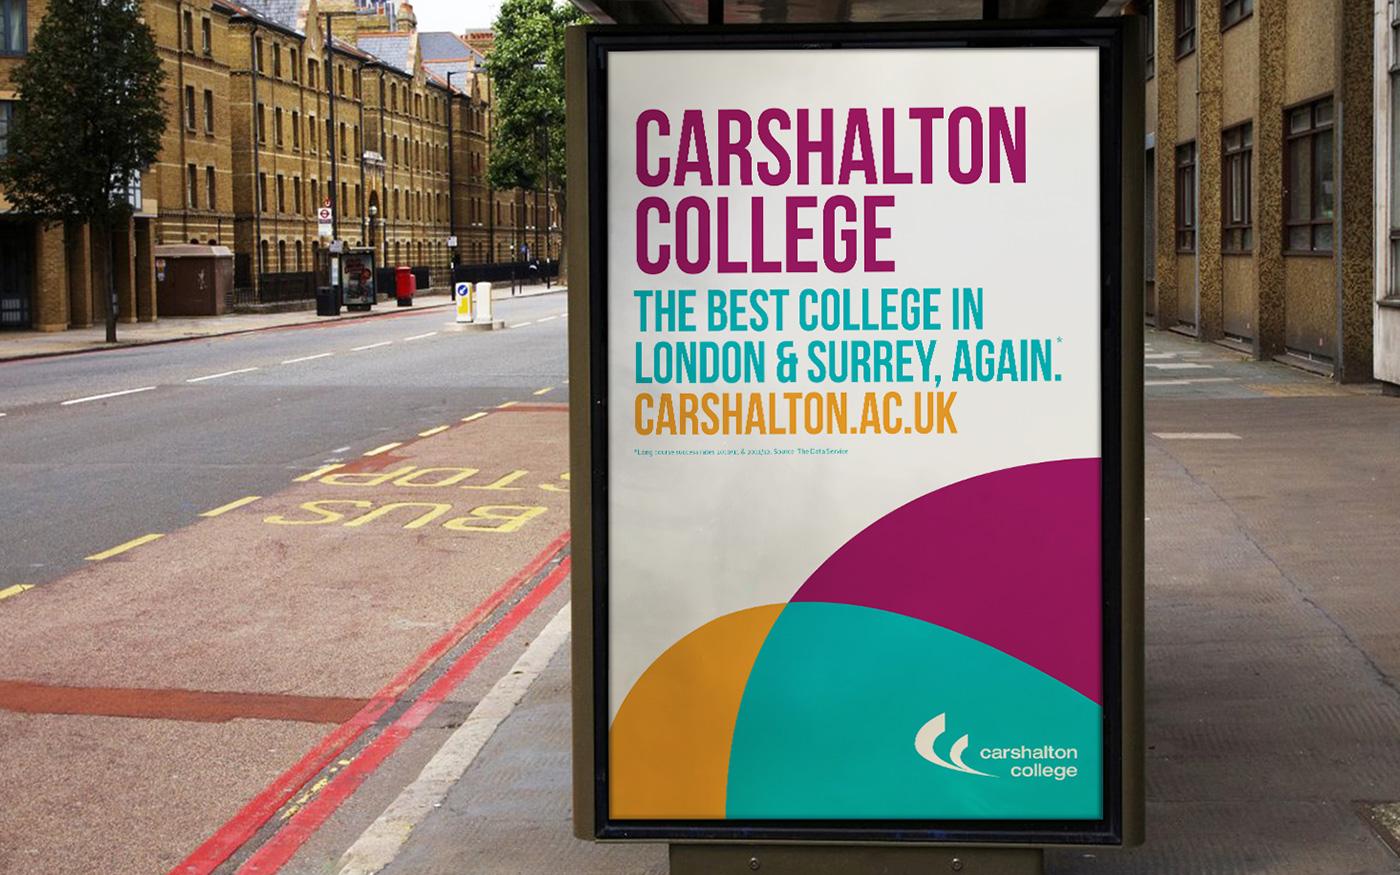 Carshalton College Bus Stop Ad